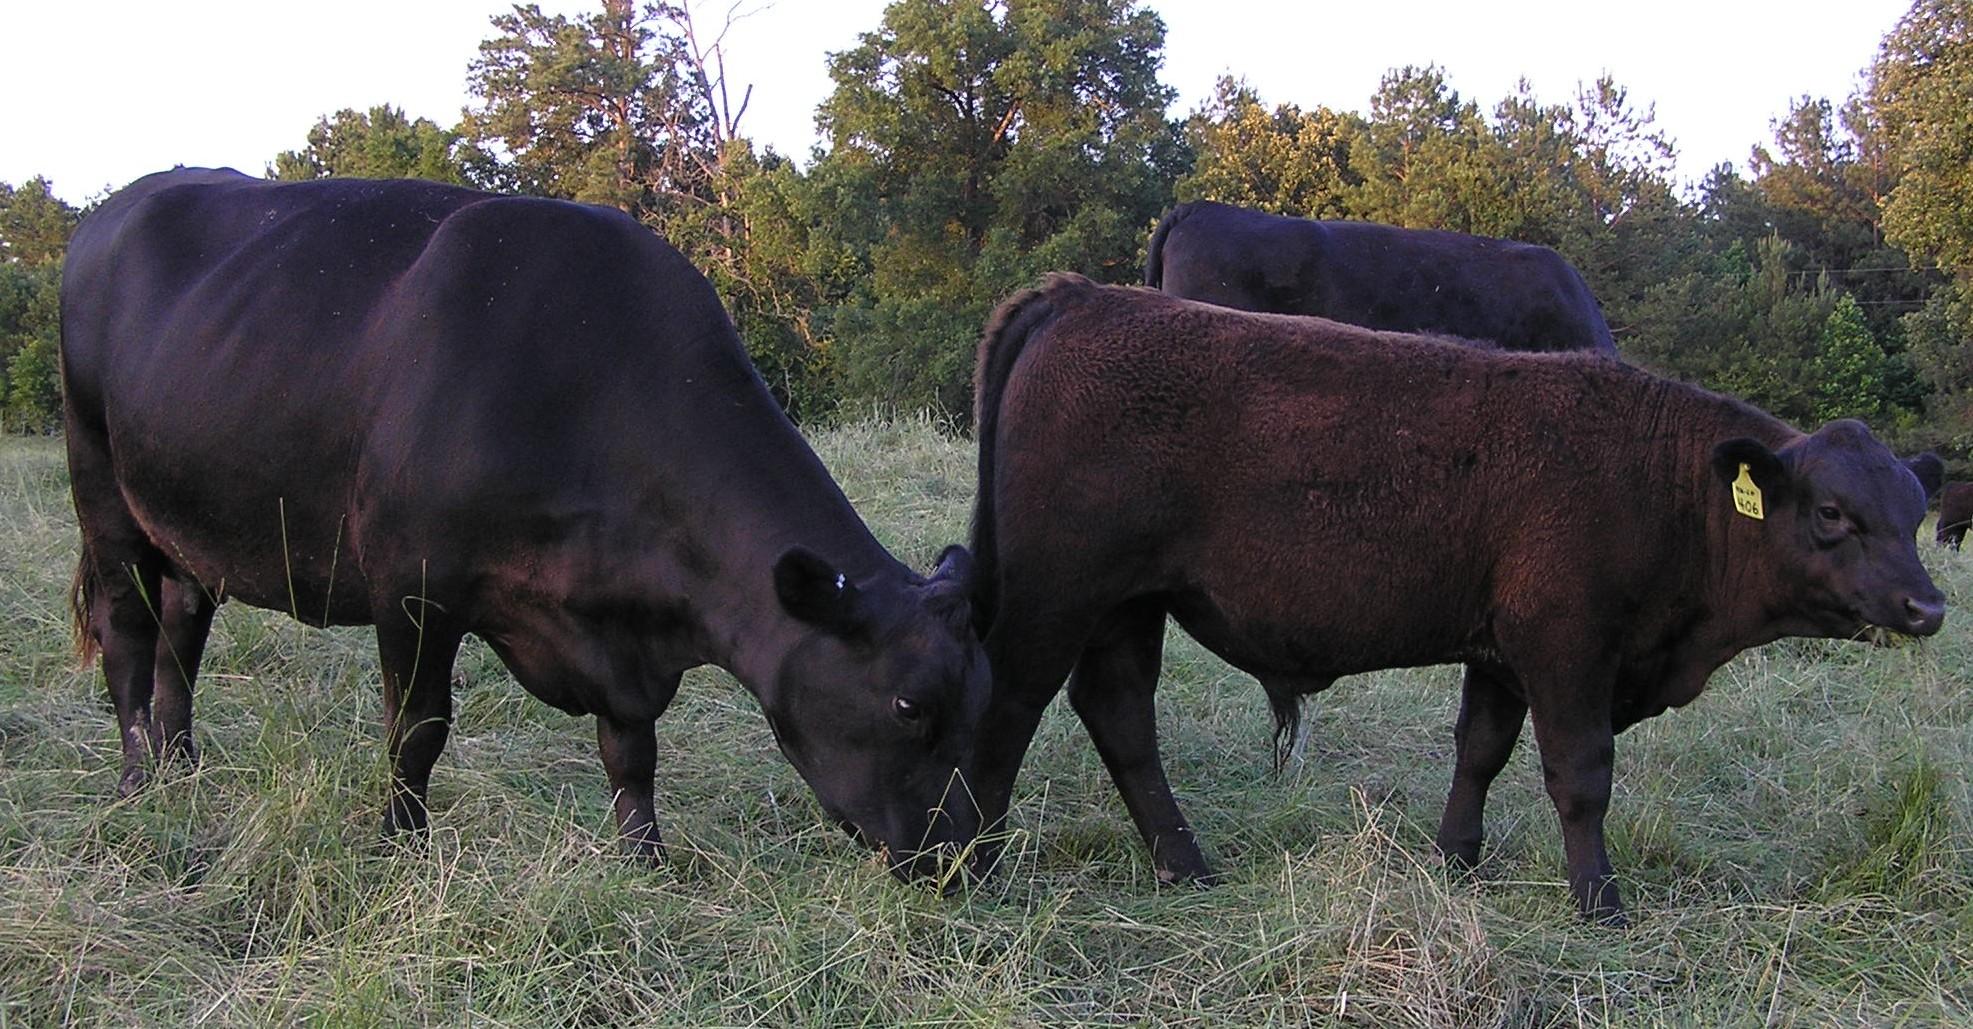 Travler 234D cow with Connealy Lead On bull calf, Calf Reg # 17781242